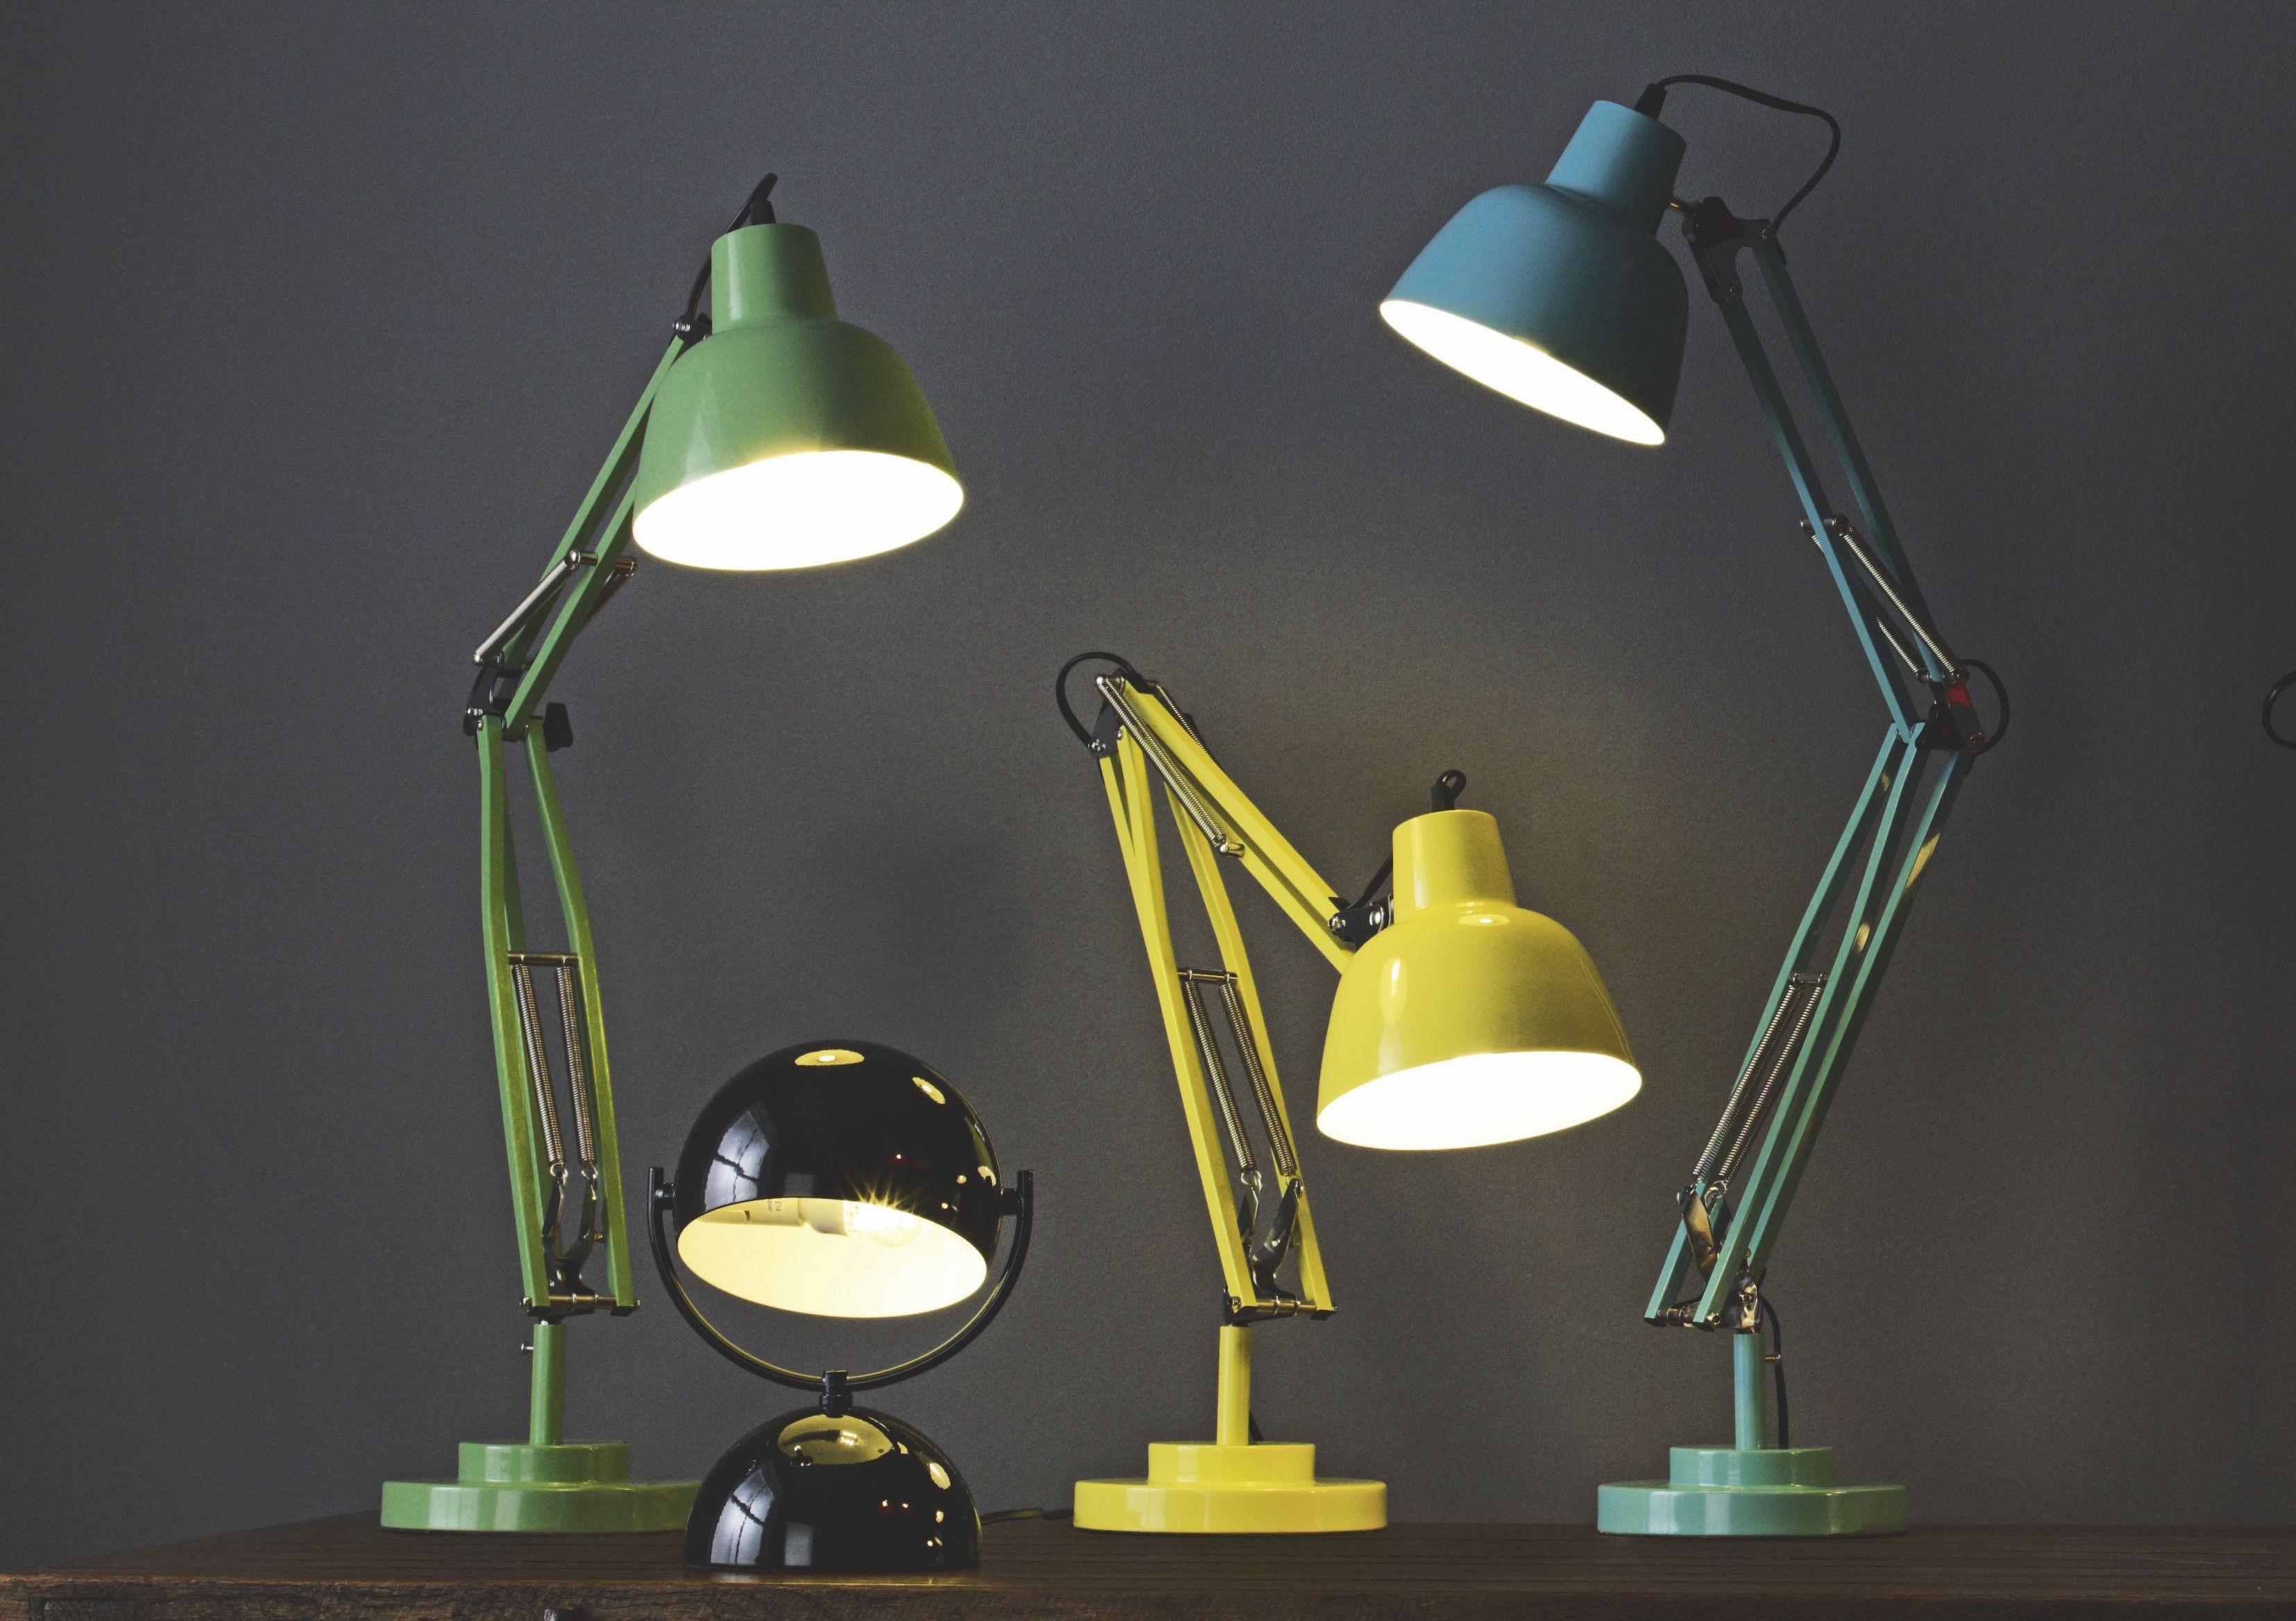 Indoor Lighting Lamp Shades amp Lights : LightingTableDeskLampscrop376164233082335ampanchor20302809ampwid600 from www.diy.com size 600 x 424 jpeg 21kB